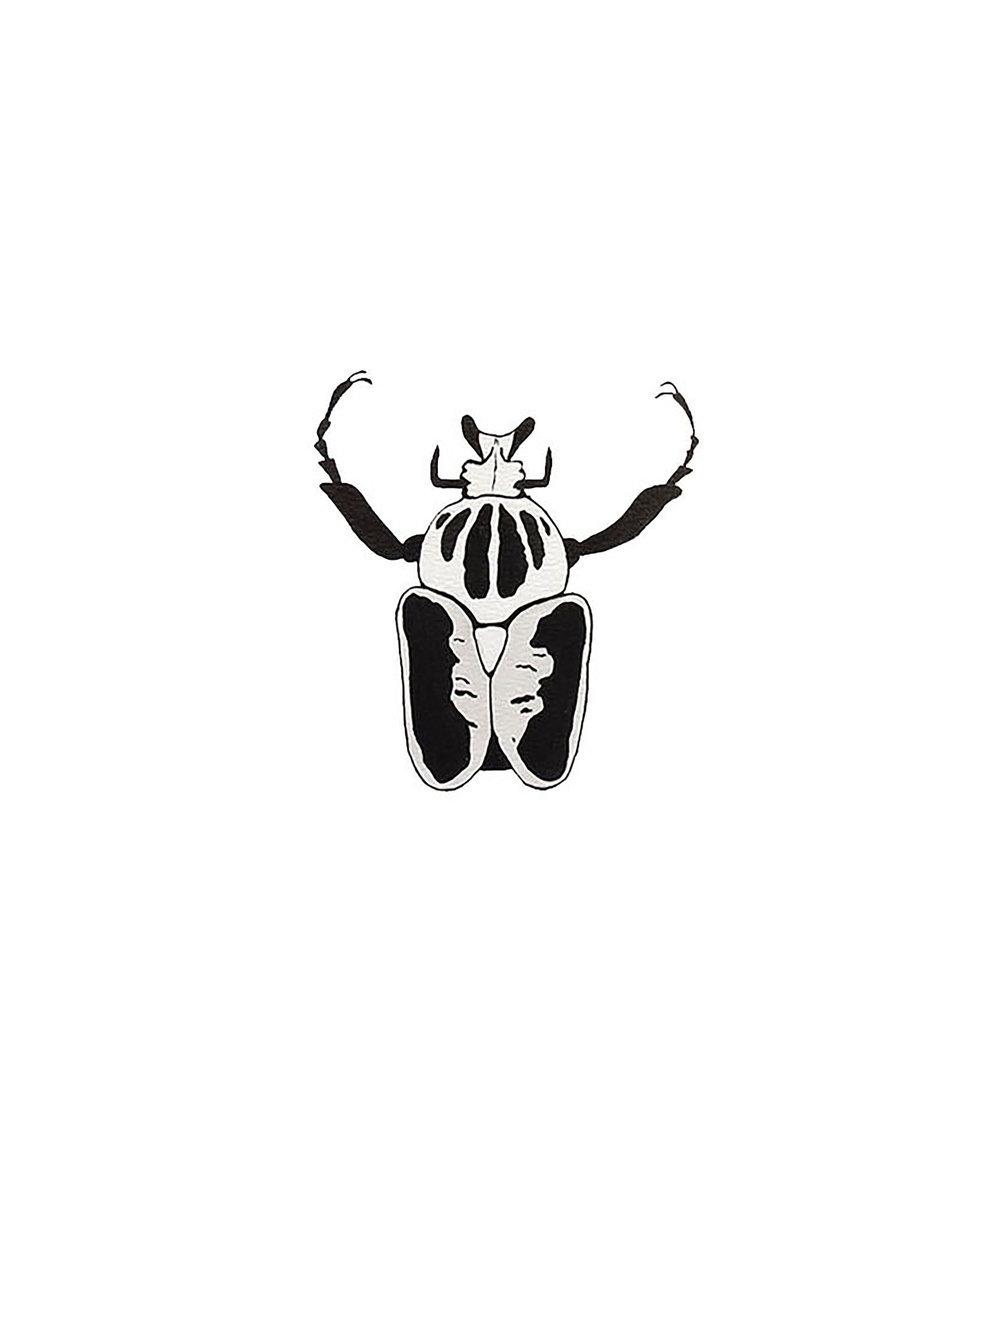 Beetle print 18x24.jpg